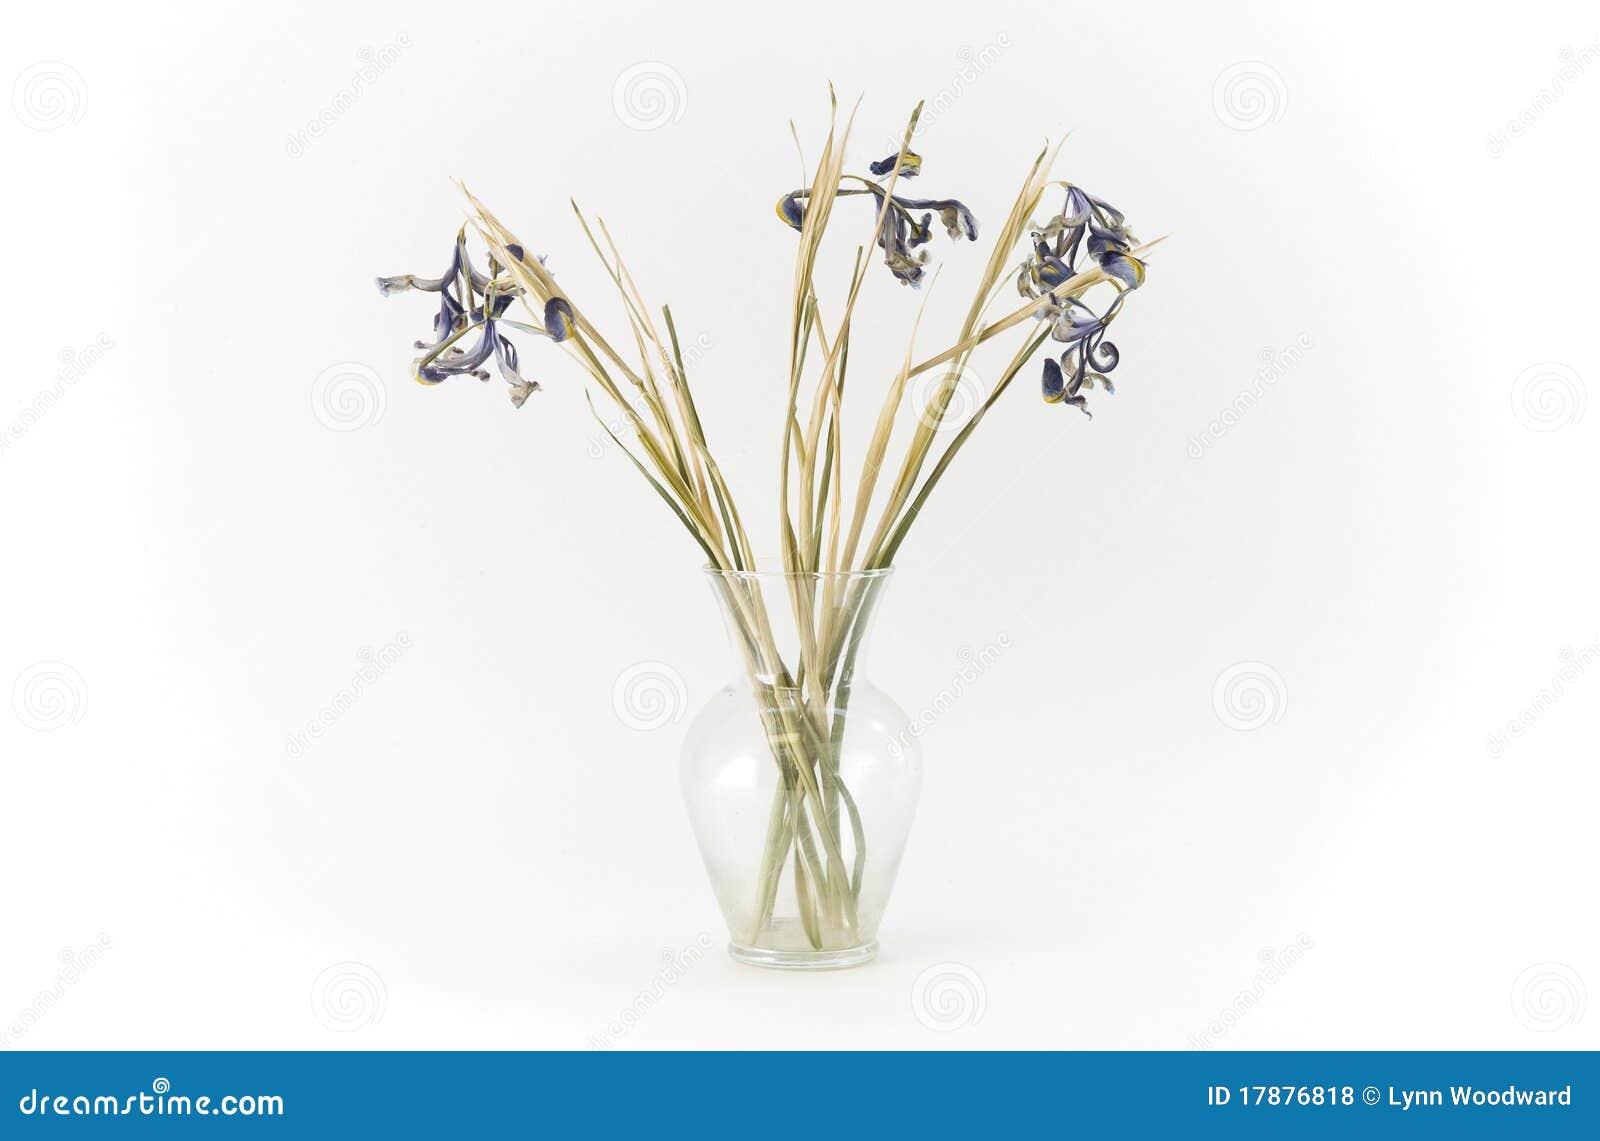 Dead Flowers In A Vase Stock Photo Image Of Iris Purple 17876818